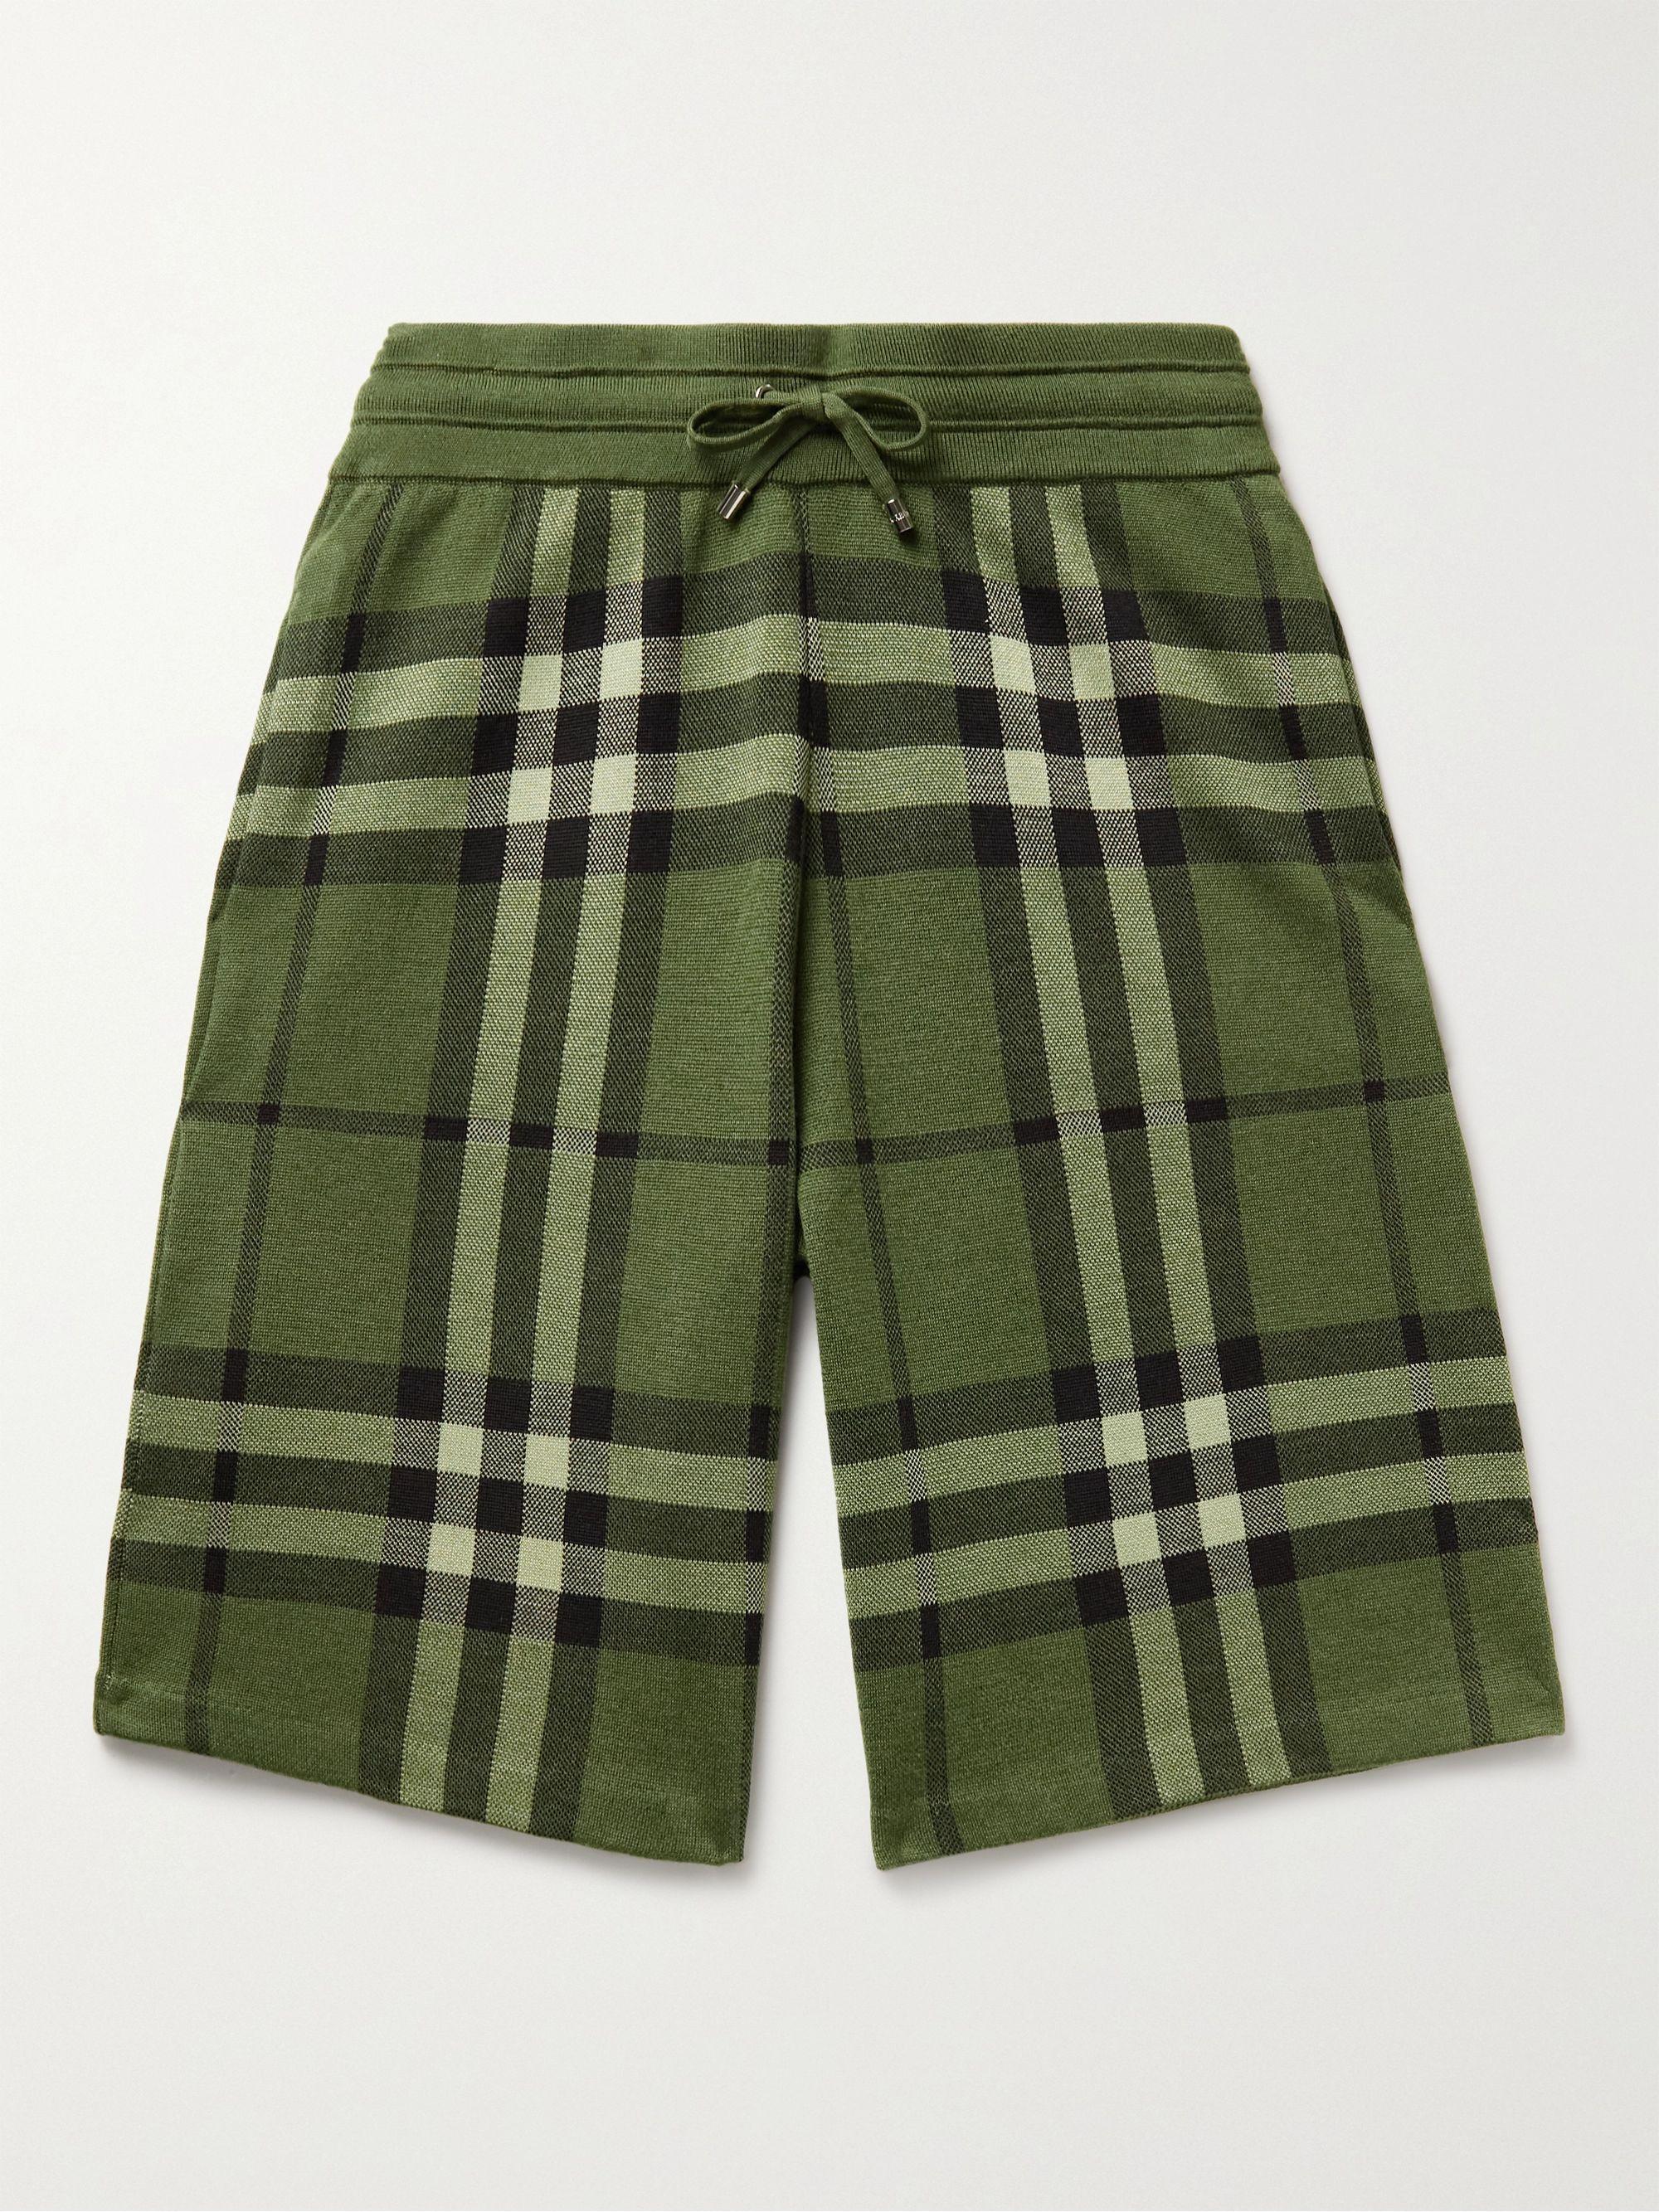 BURBERRY Checked Silk and Wool-Blend Jacquard Drawstring Shorts